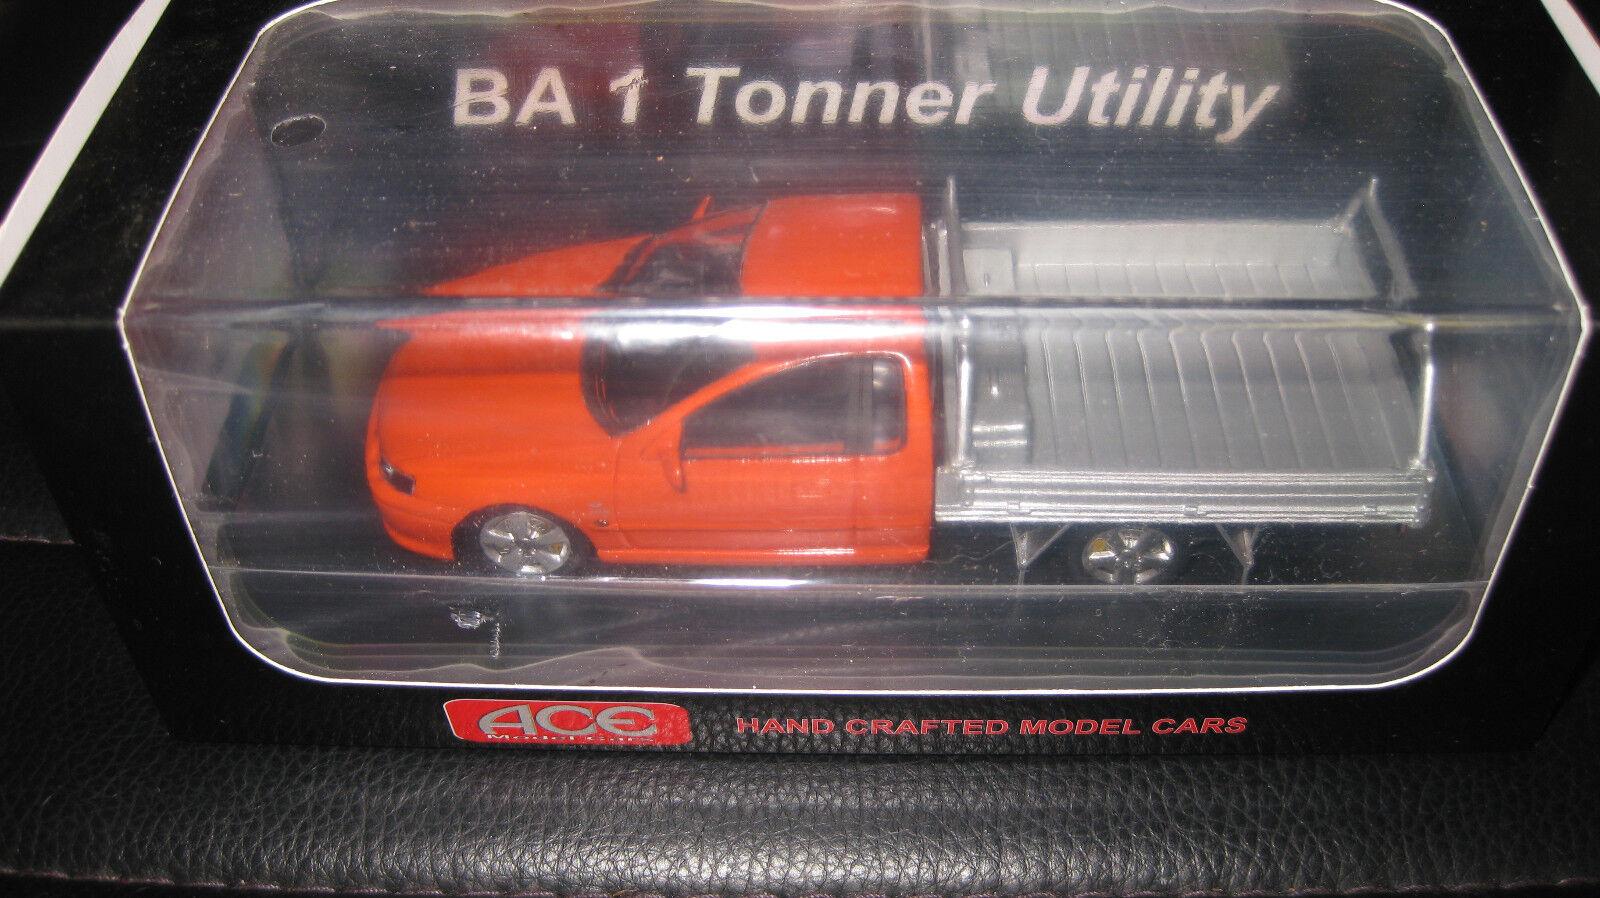 1 43 ACE MODEL CARS FORD FALCON BA 1 1 1 TONNER UTE BLOOD orange LTD EDITION a5ee7b